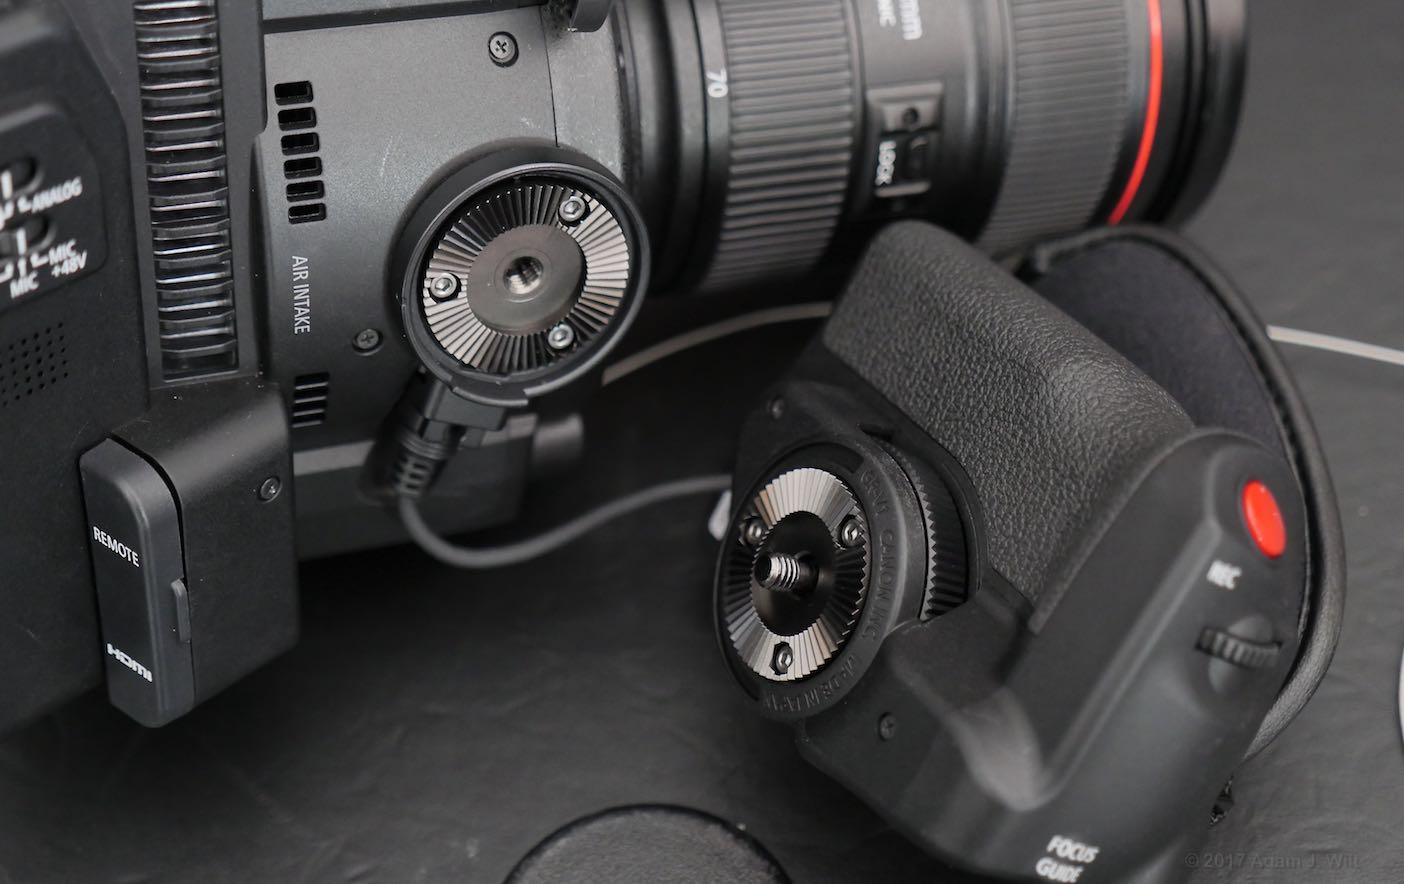 Cine Gear Expo: Three Cameras by Adam Wilt - ProVideo Coalition